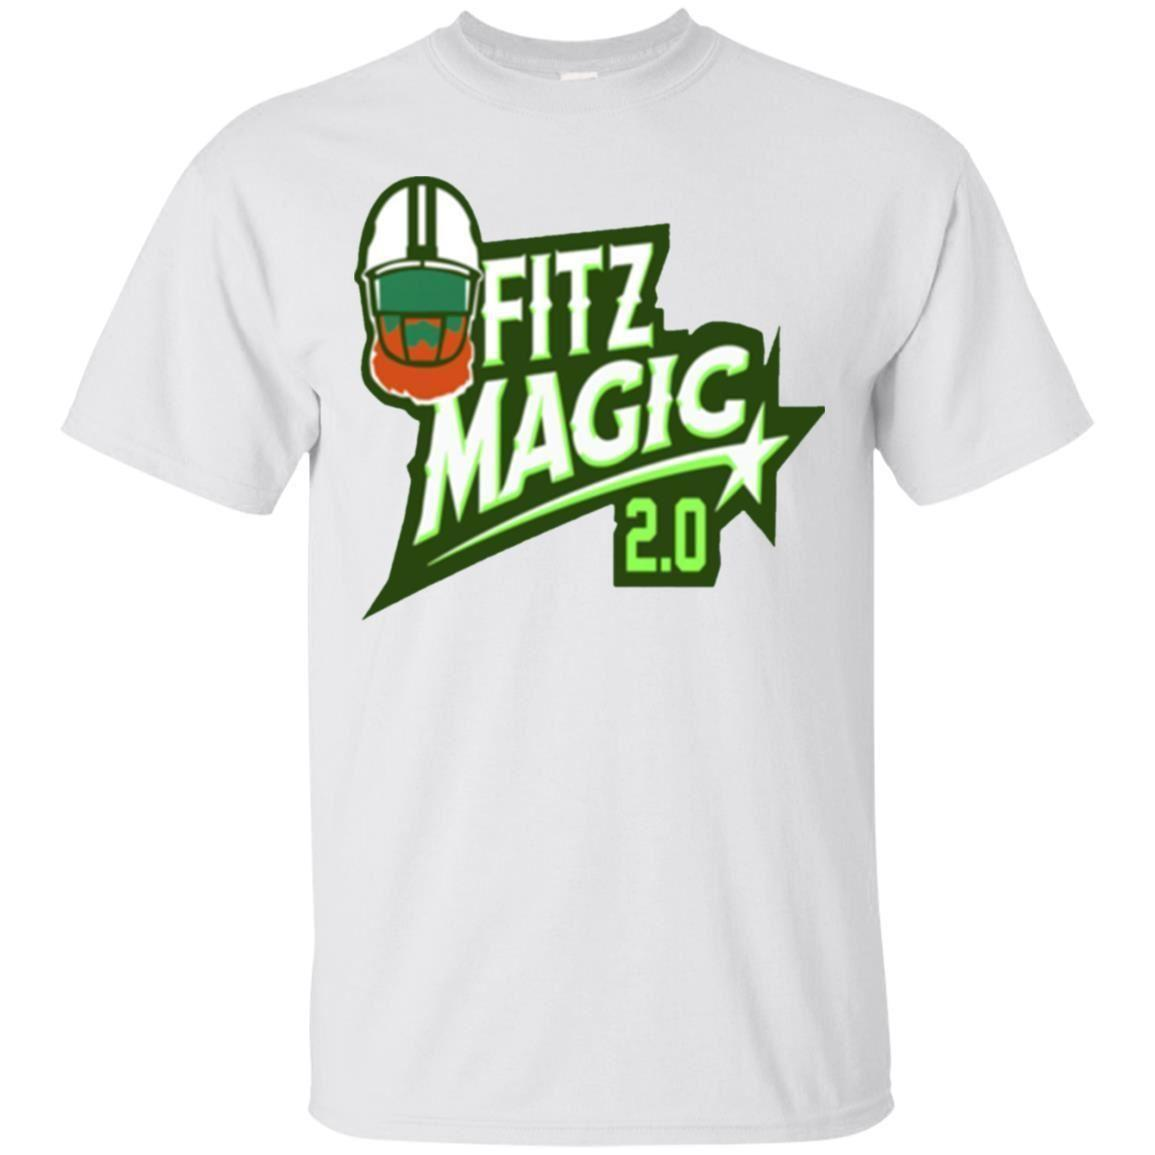 the latest bdbb2 e1bb4 Ryan Fitzpatrick FItzMagic T-shirt Fitzmagic Buccaneers Tee Short Sleeve  S-5XL 2018 Summer short sleeves summer Hot Sale Men S Lastest